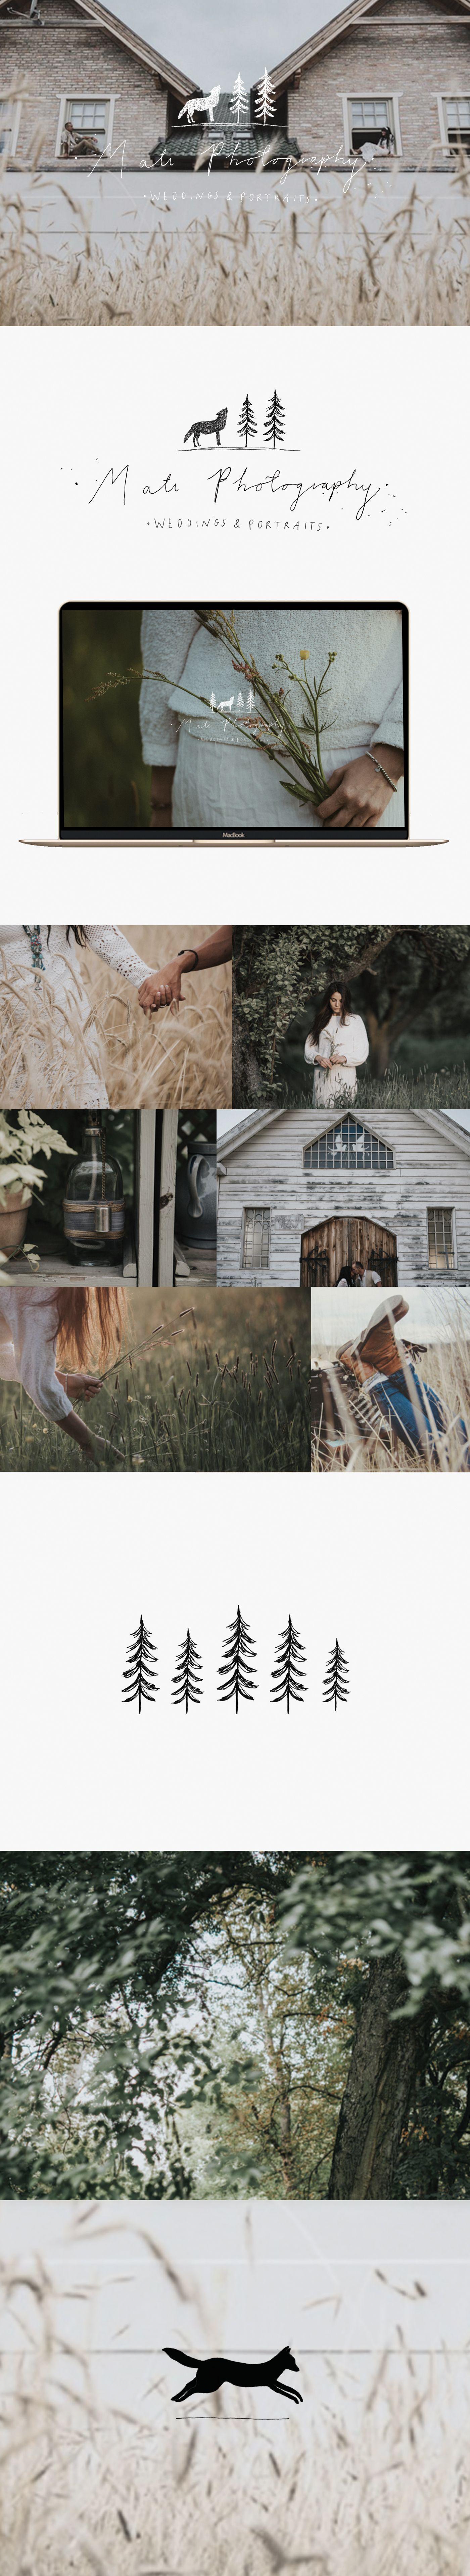 Branding for Mati Photography by Ryn Frank | Branding | Pinterest ...